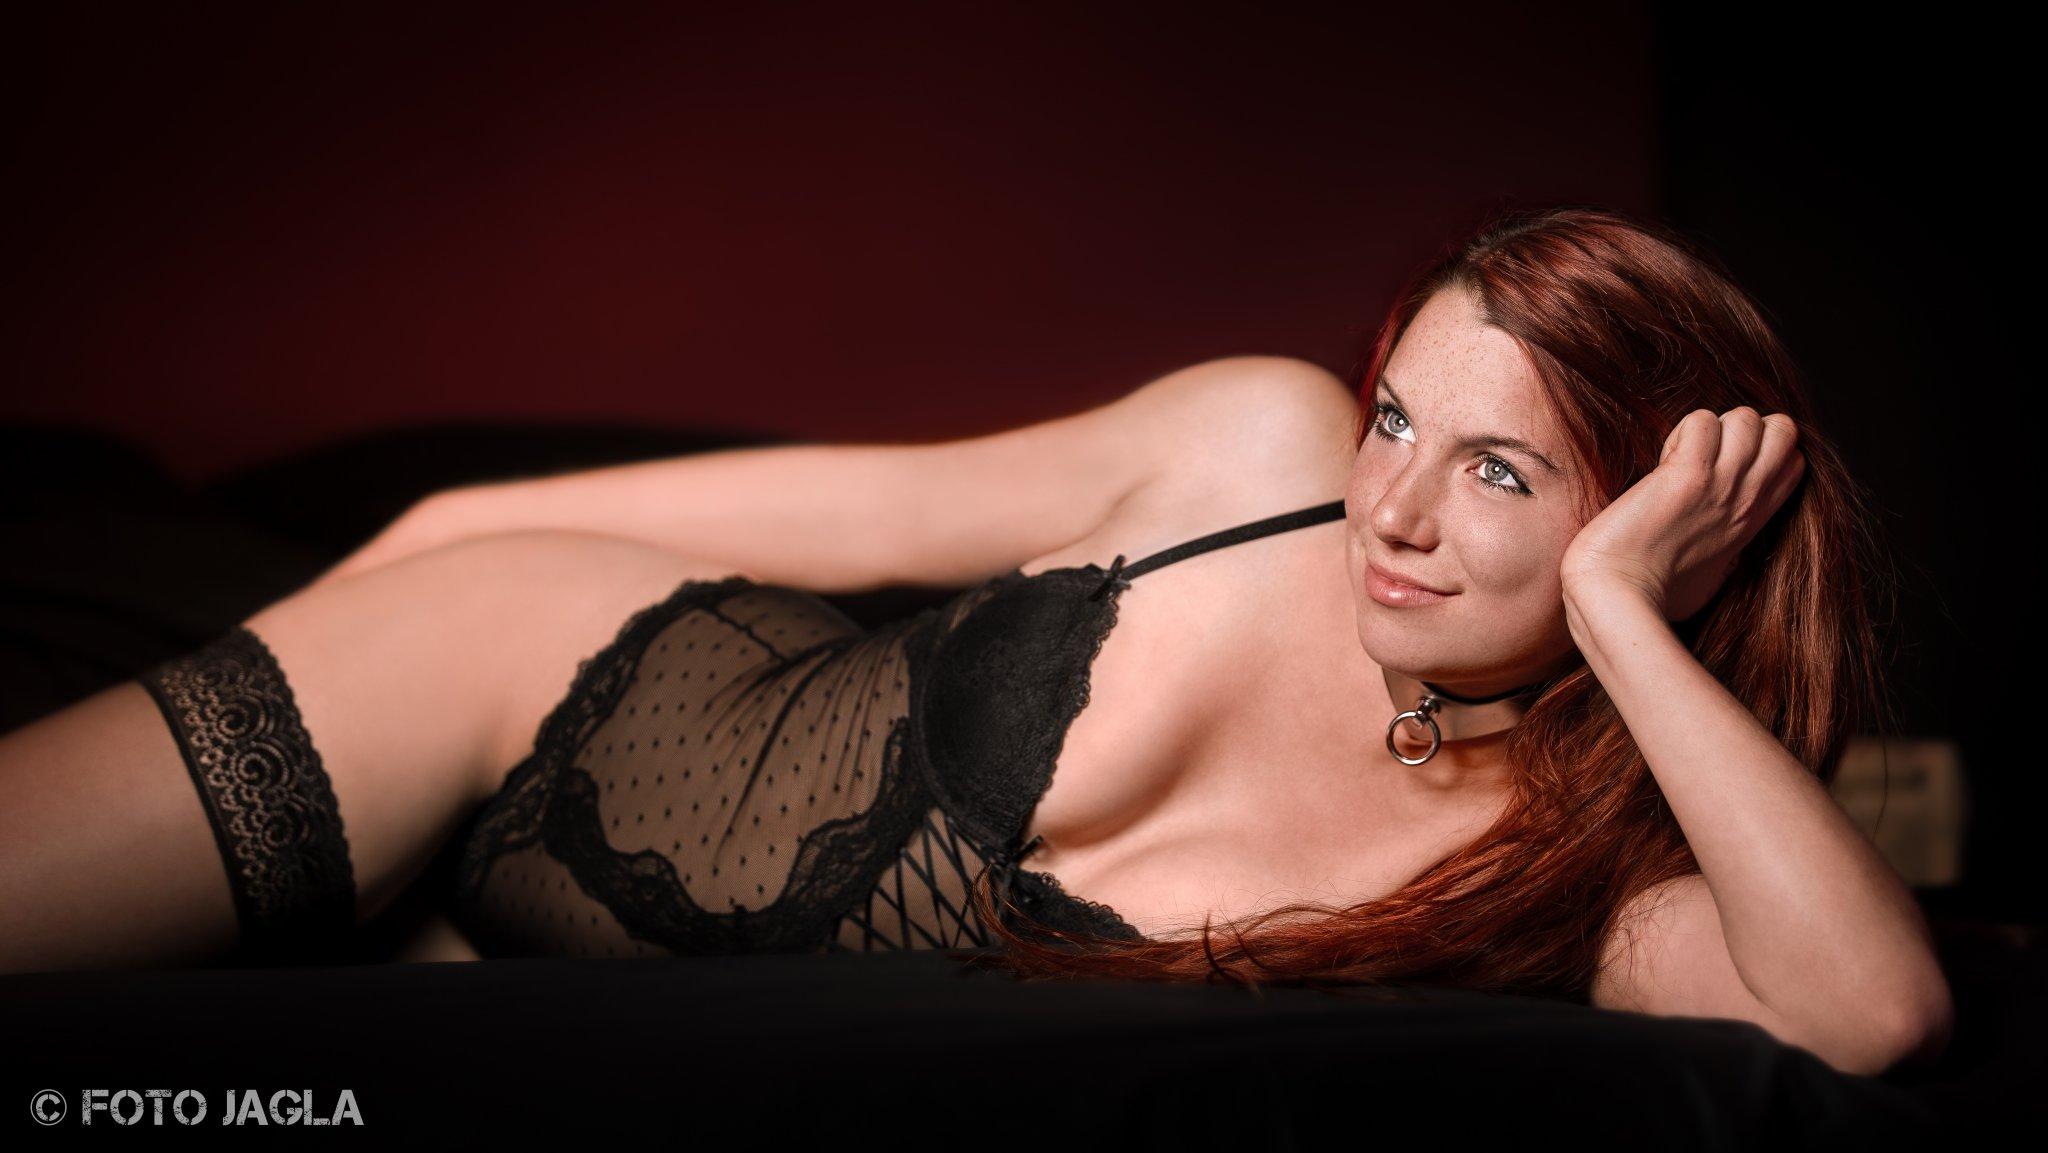 Erotisches Shooting in Dessous mit Model Ronja